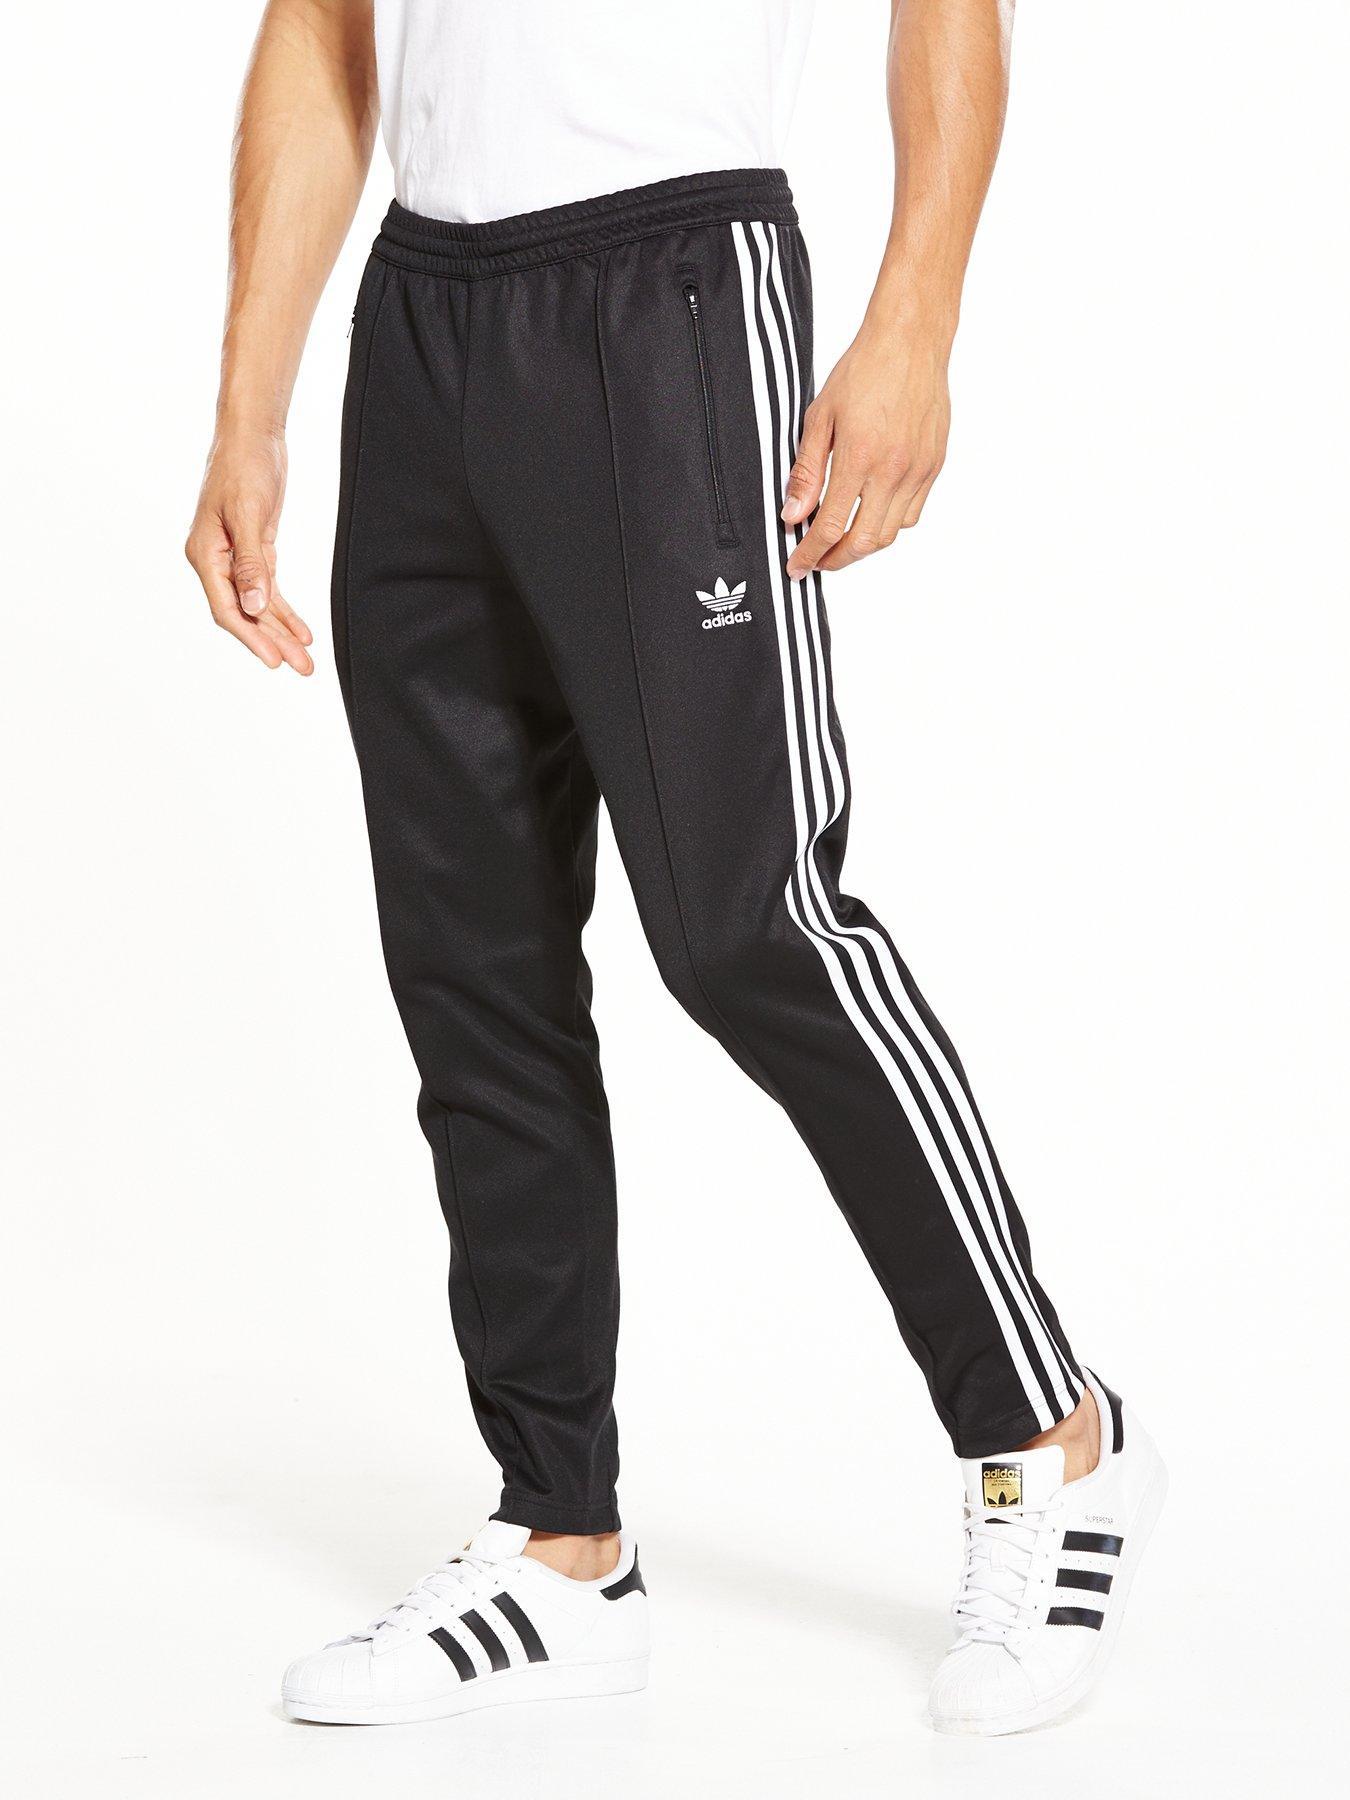 adidas originals jogging bottoms for men